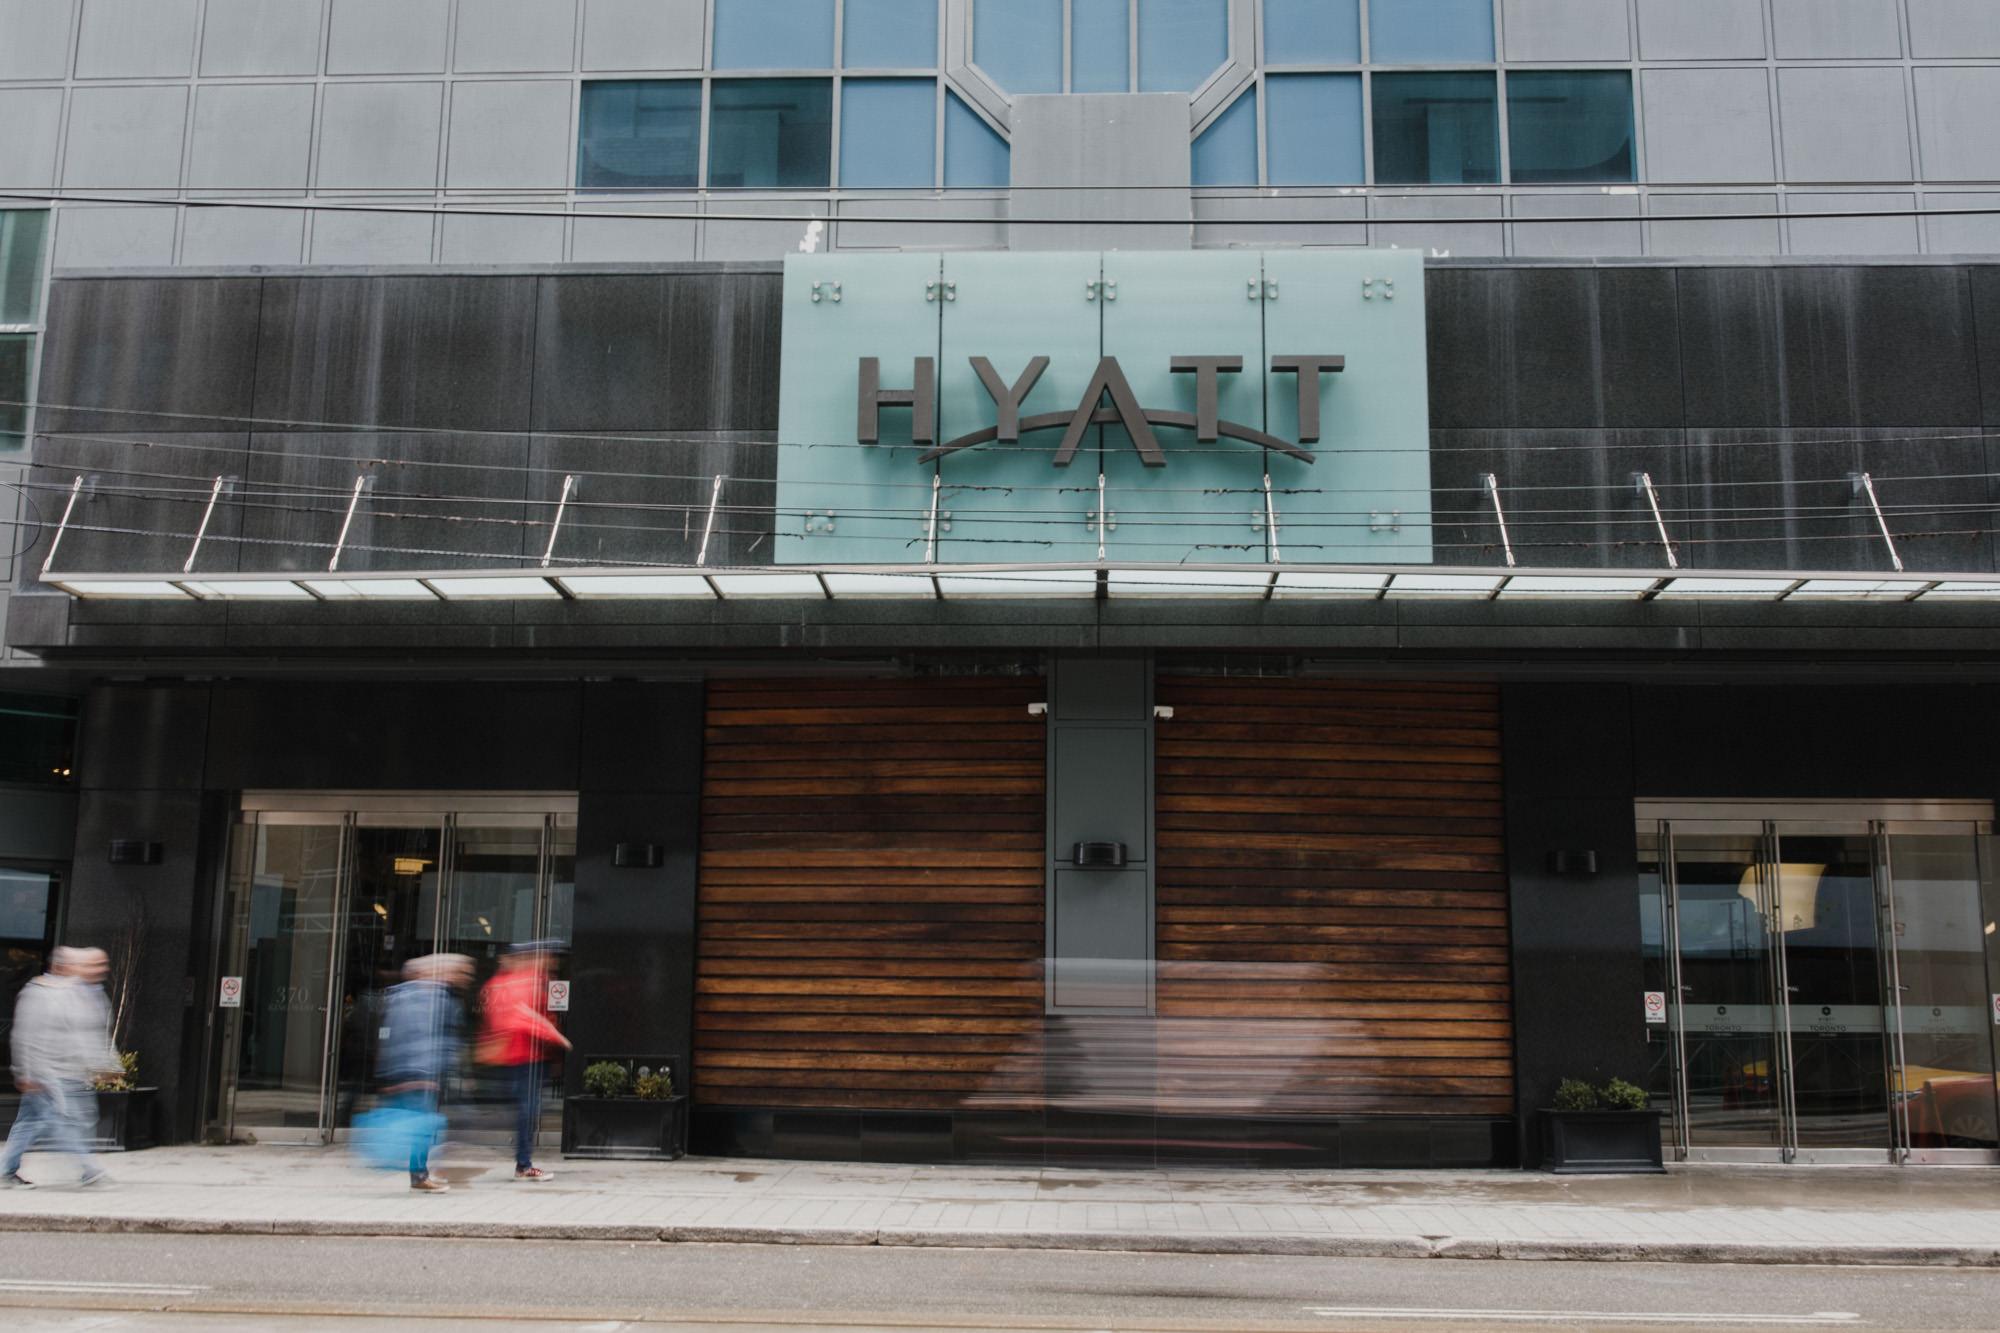 Hyatt Hotel Toronto